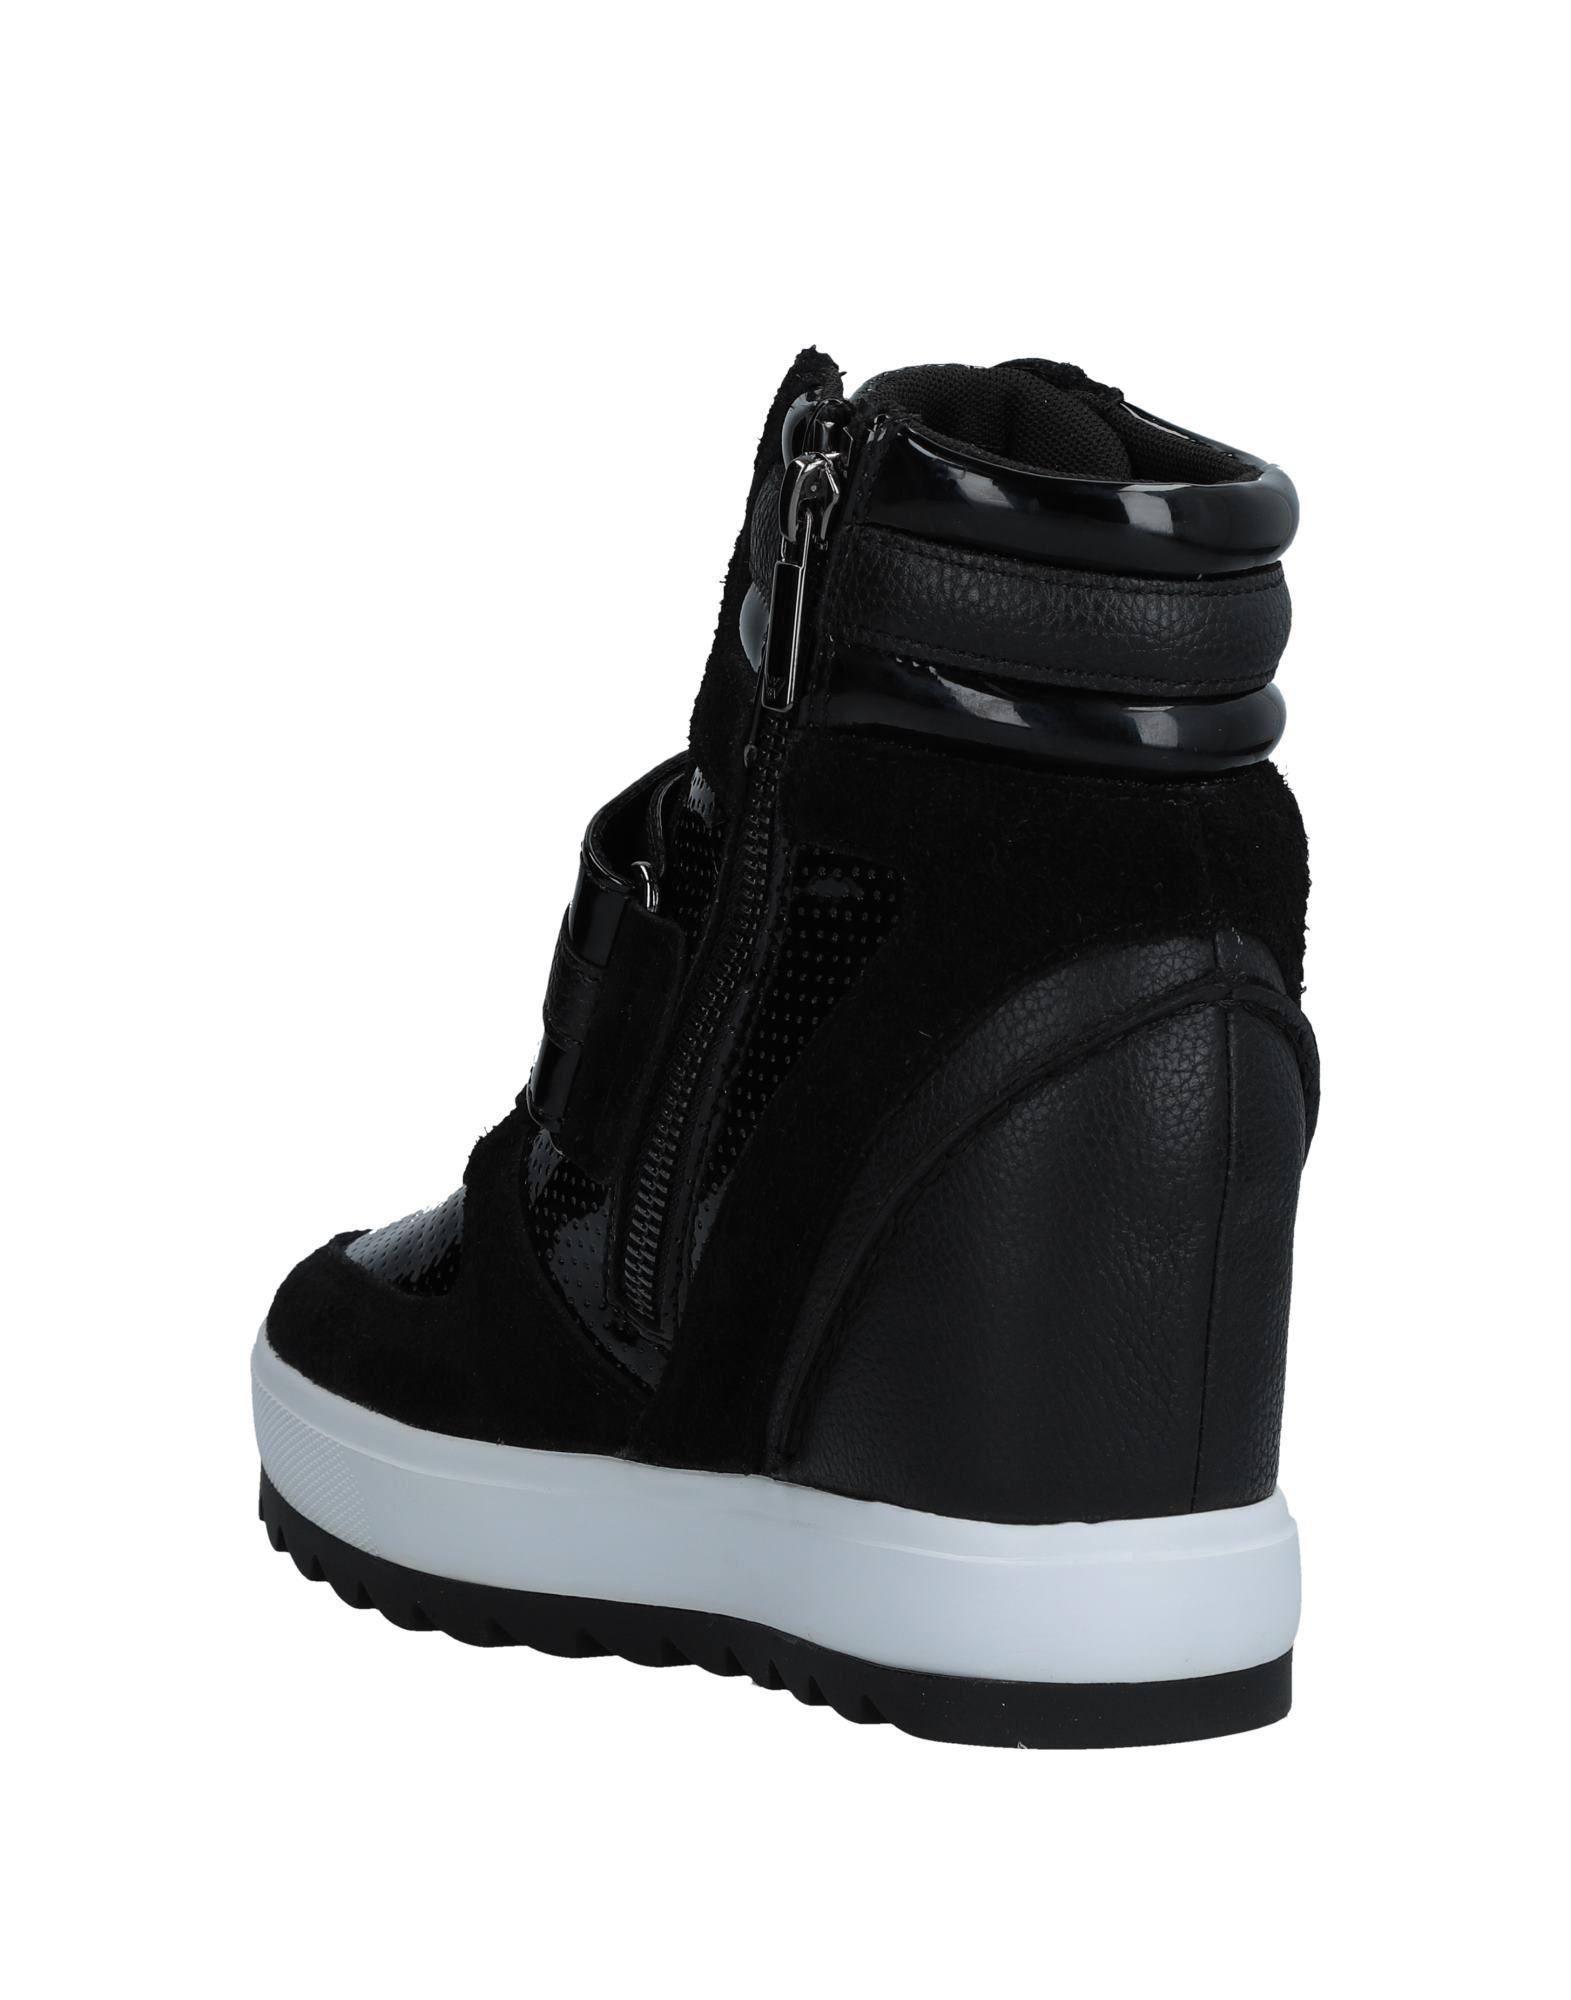 Armani Jeans aussehende Sneakers Damen  11541808WTGut aussehende Jeans strapazierfähige Schuhe 9da214